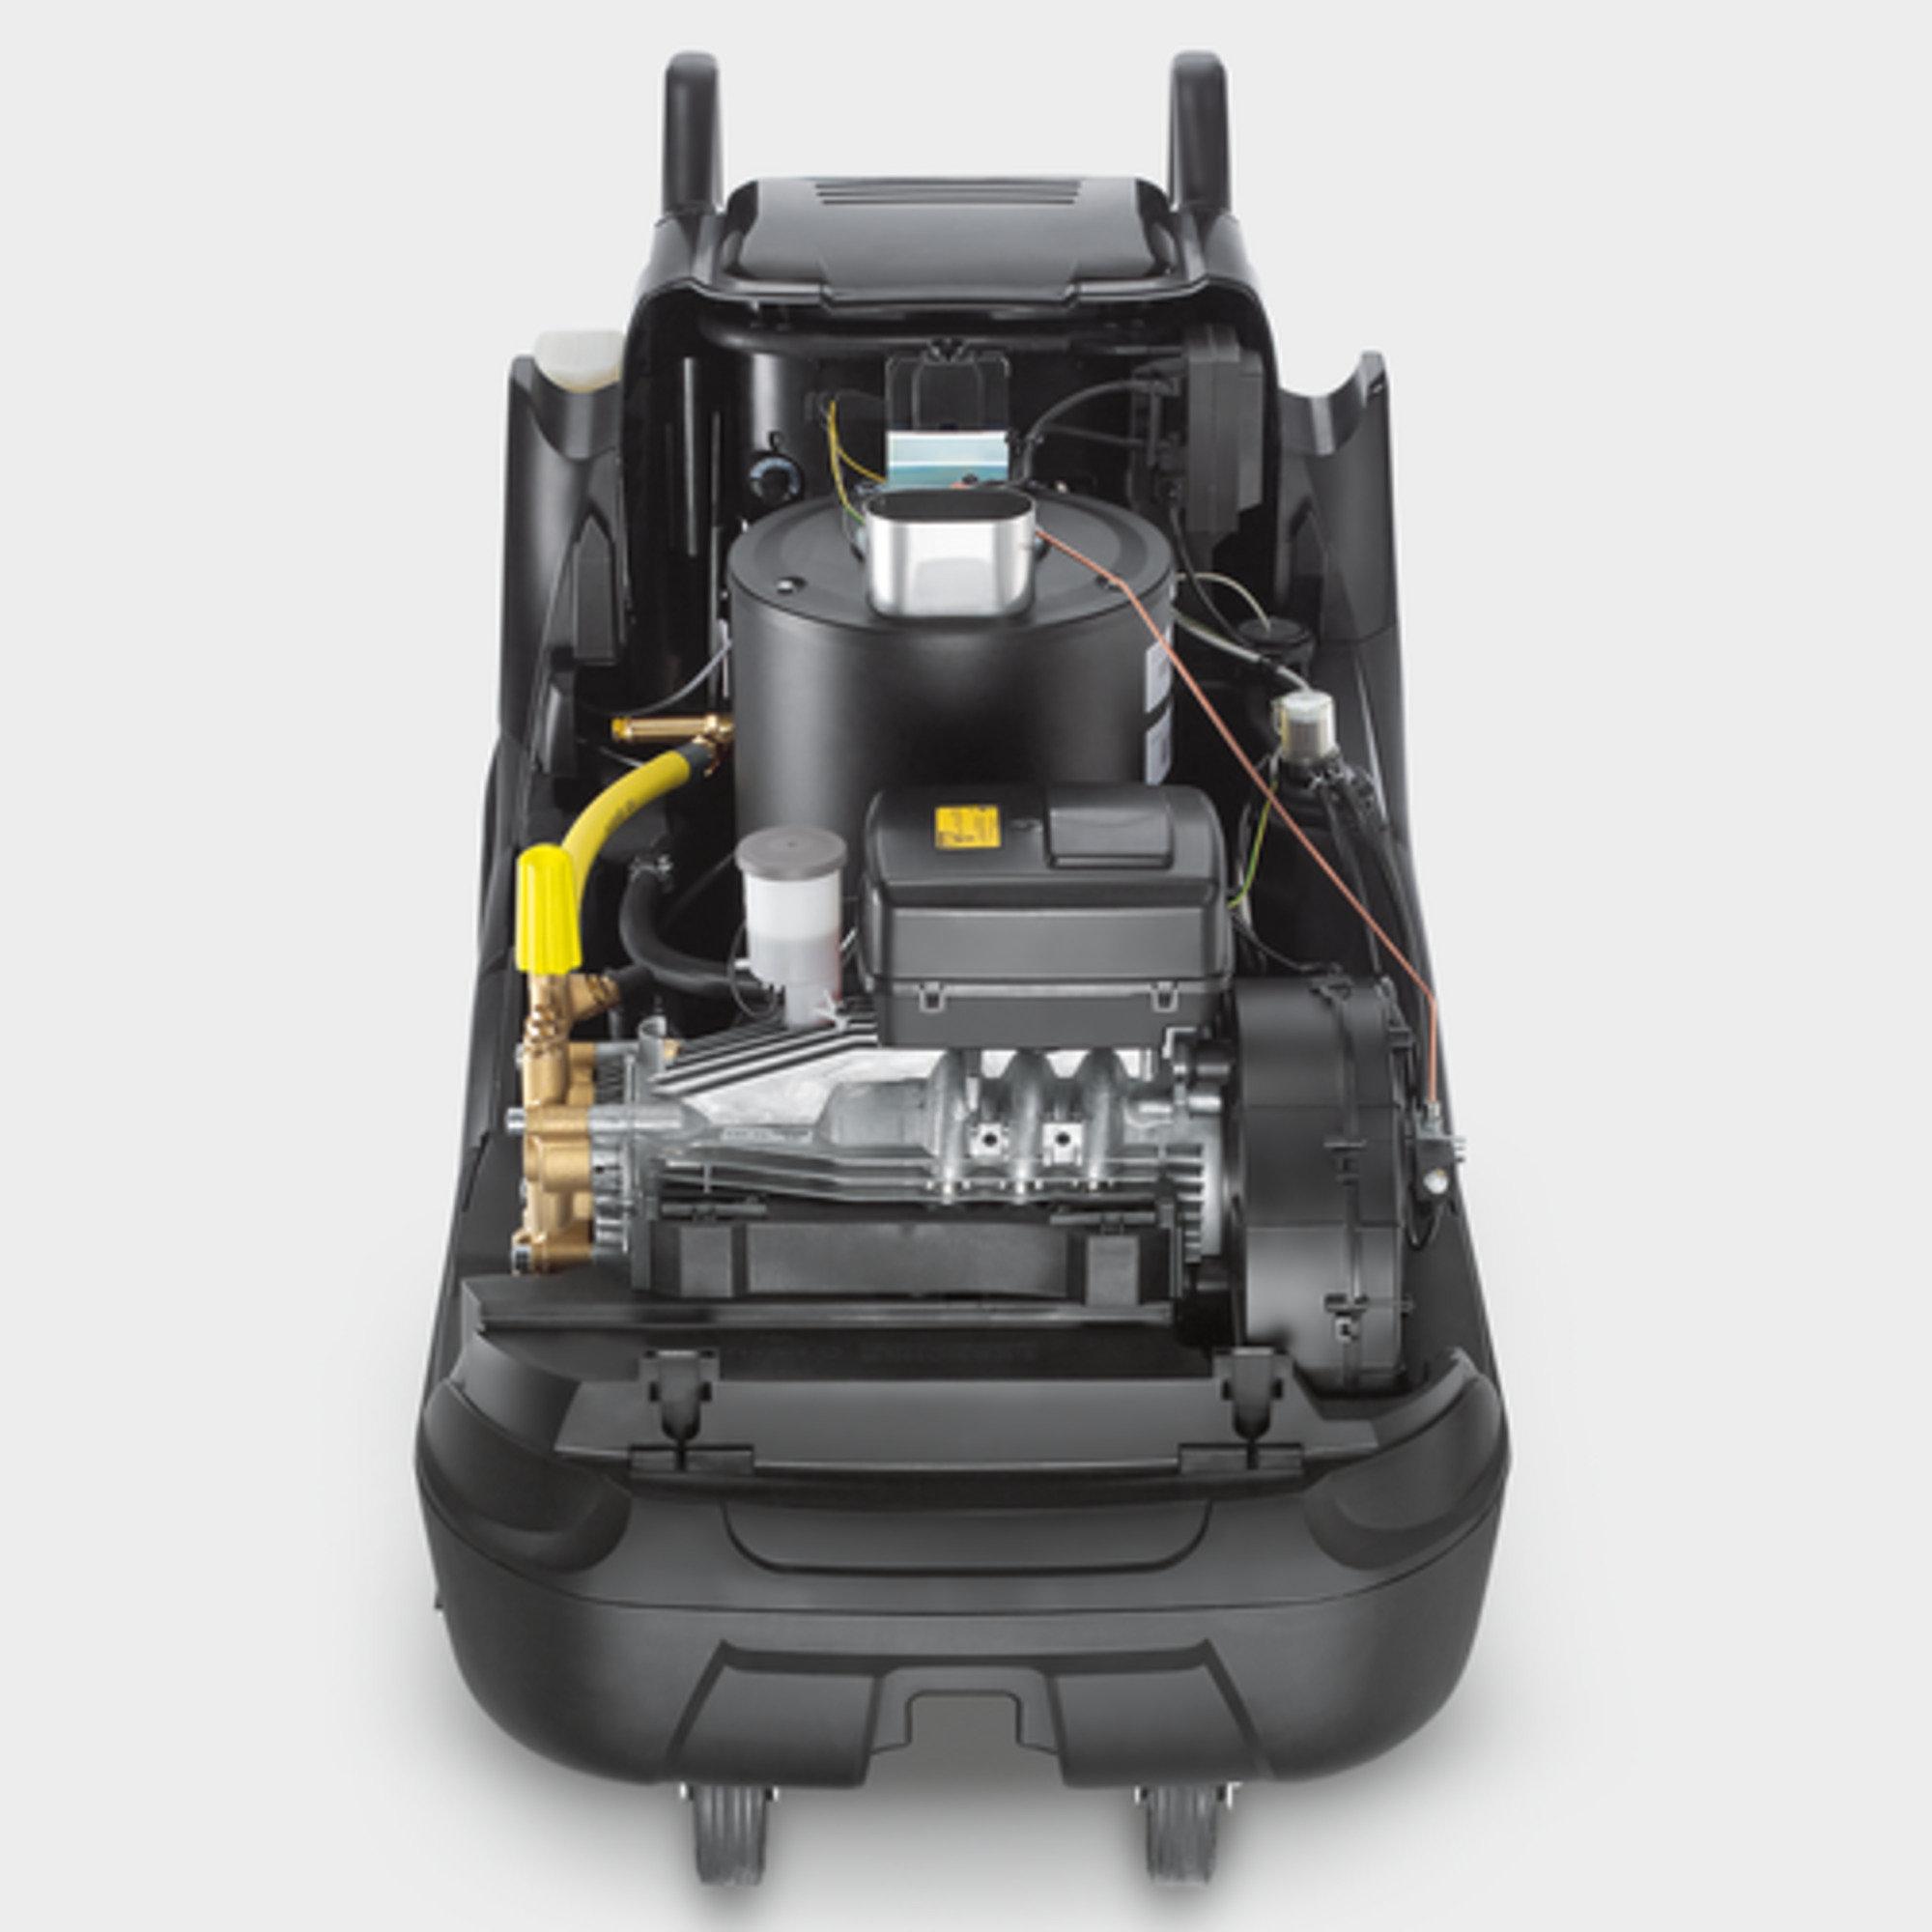 High pressure washer HDS 7/10-4 M: Maximum efficiency